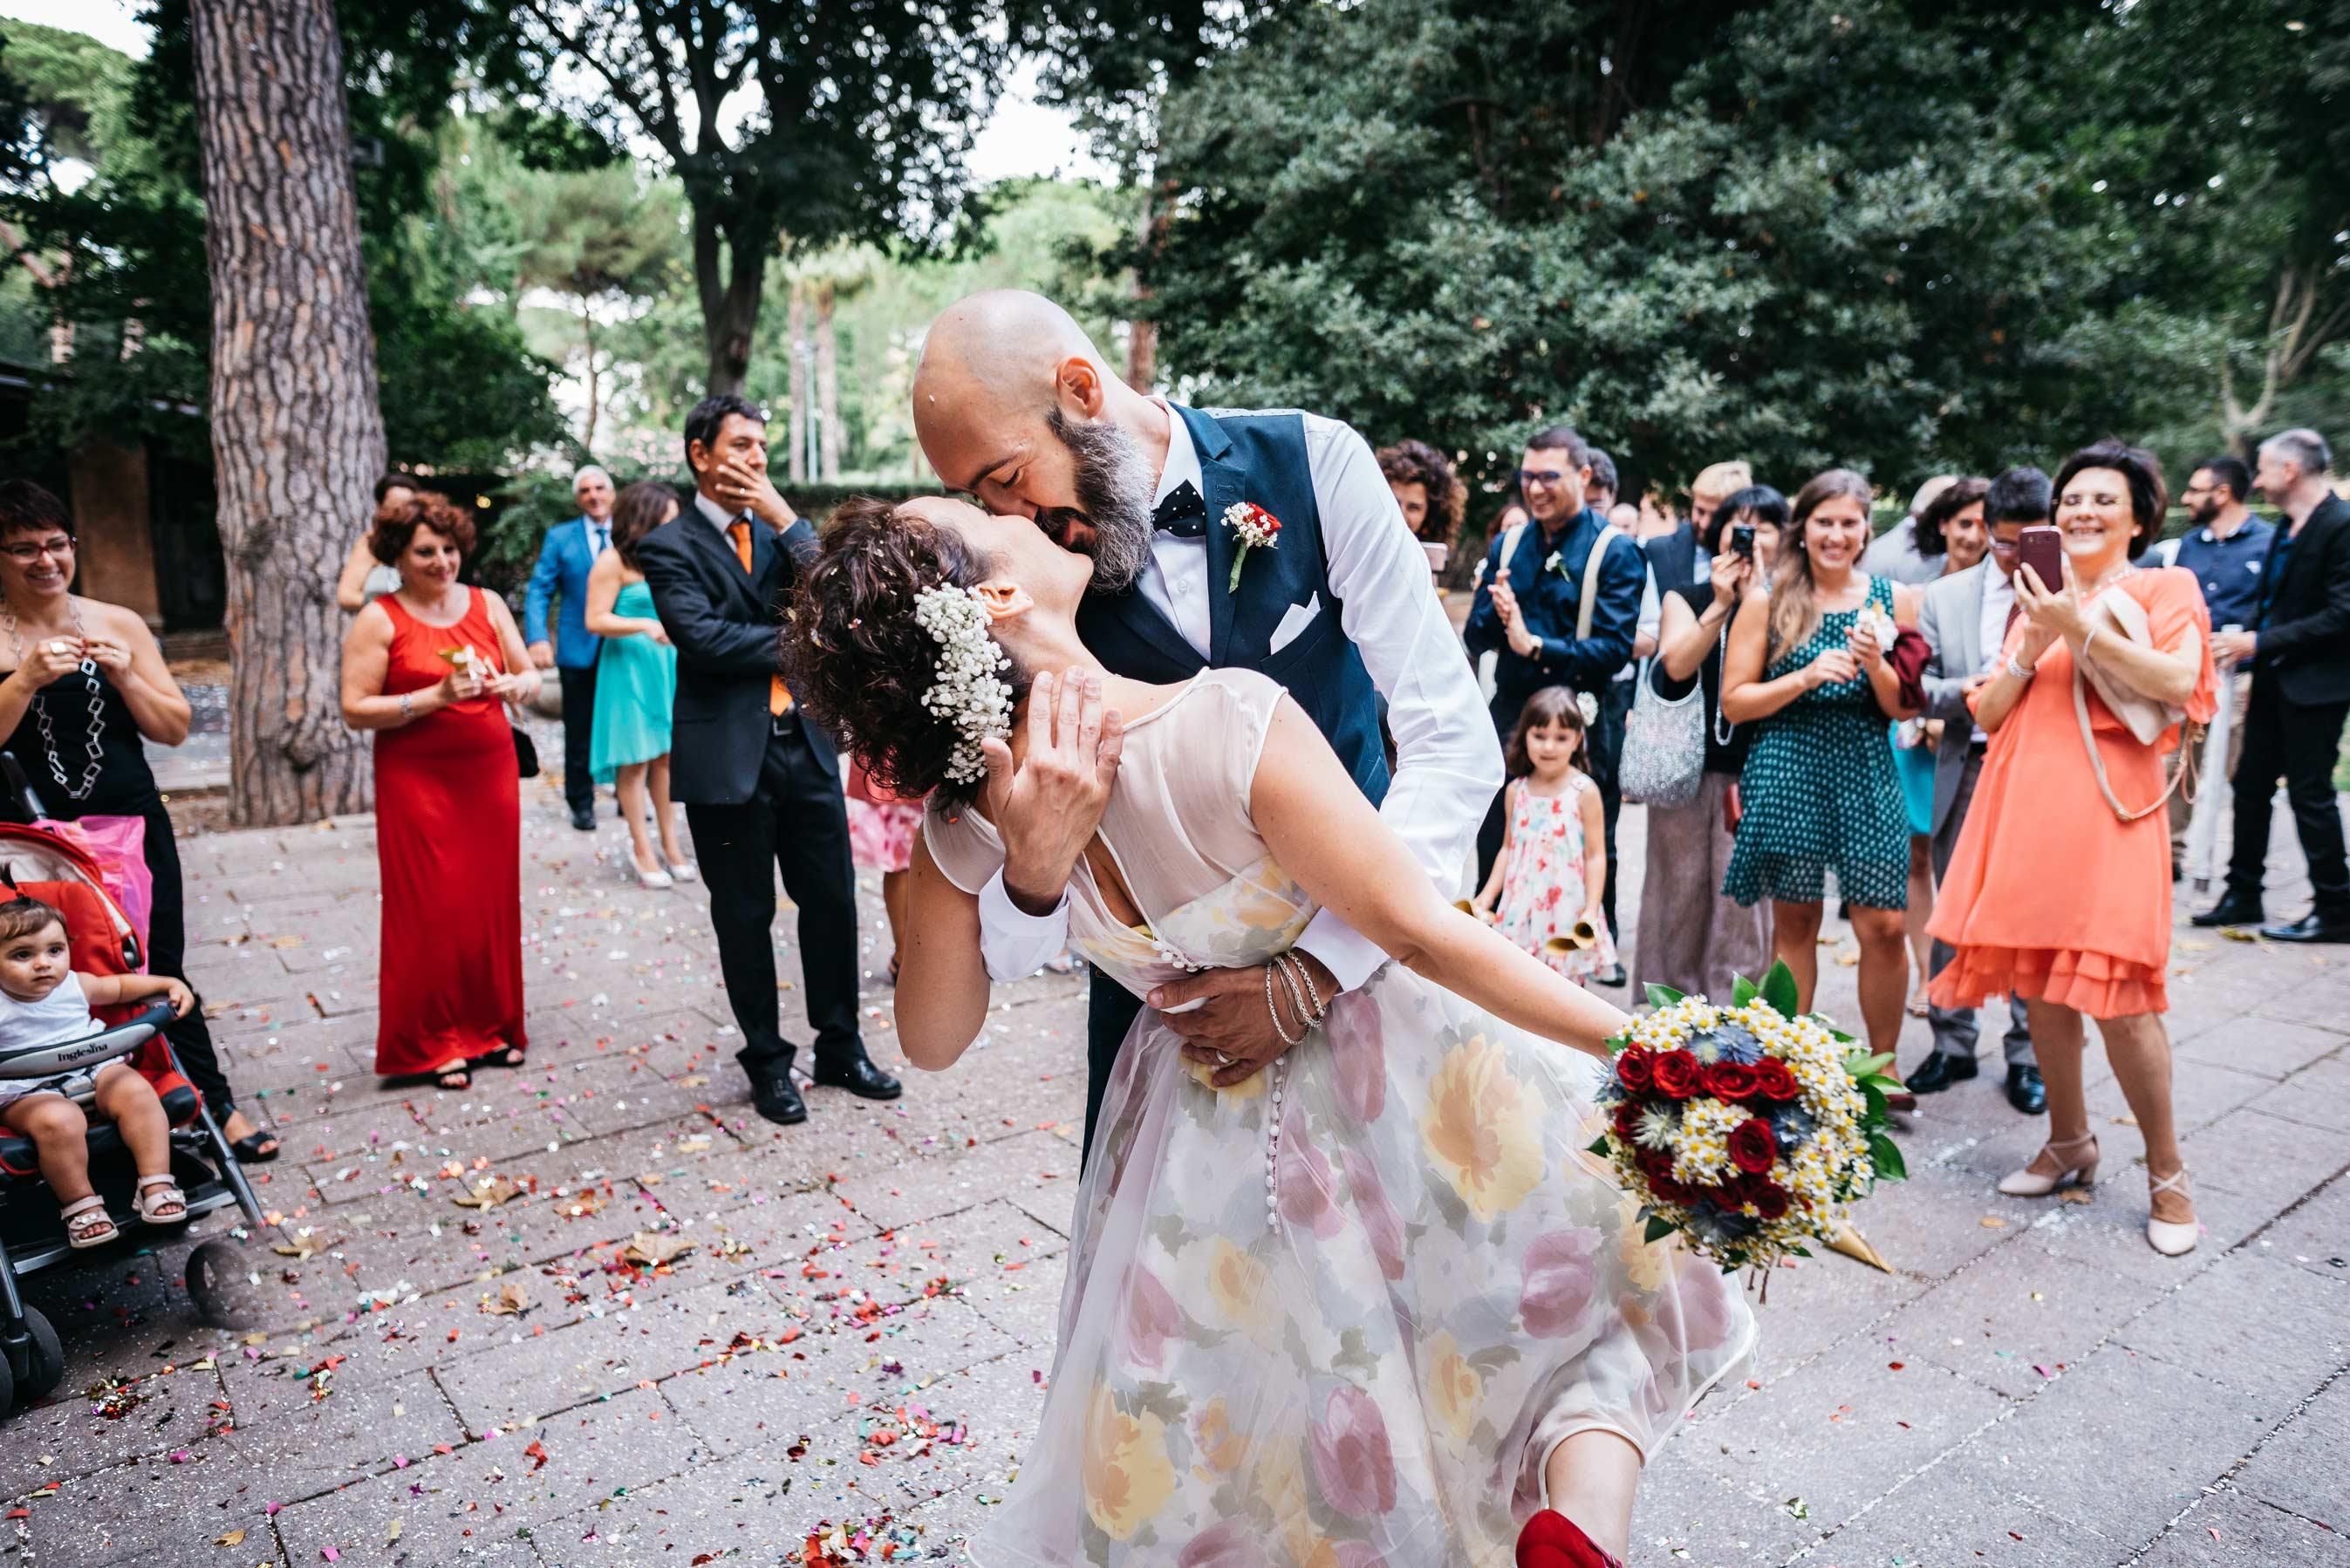 Fotografo-Sposi-Reportage-Matrimonio-Cerimonia